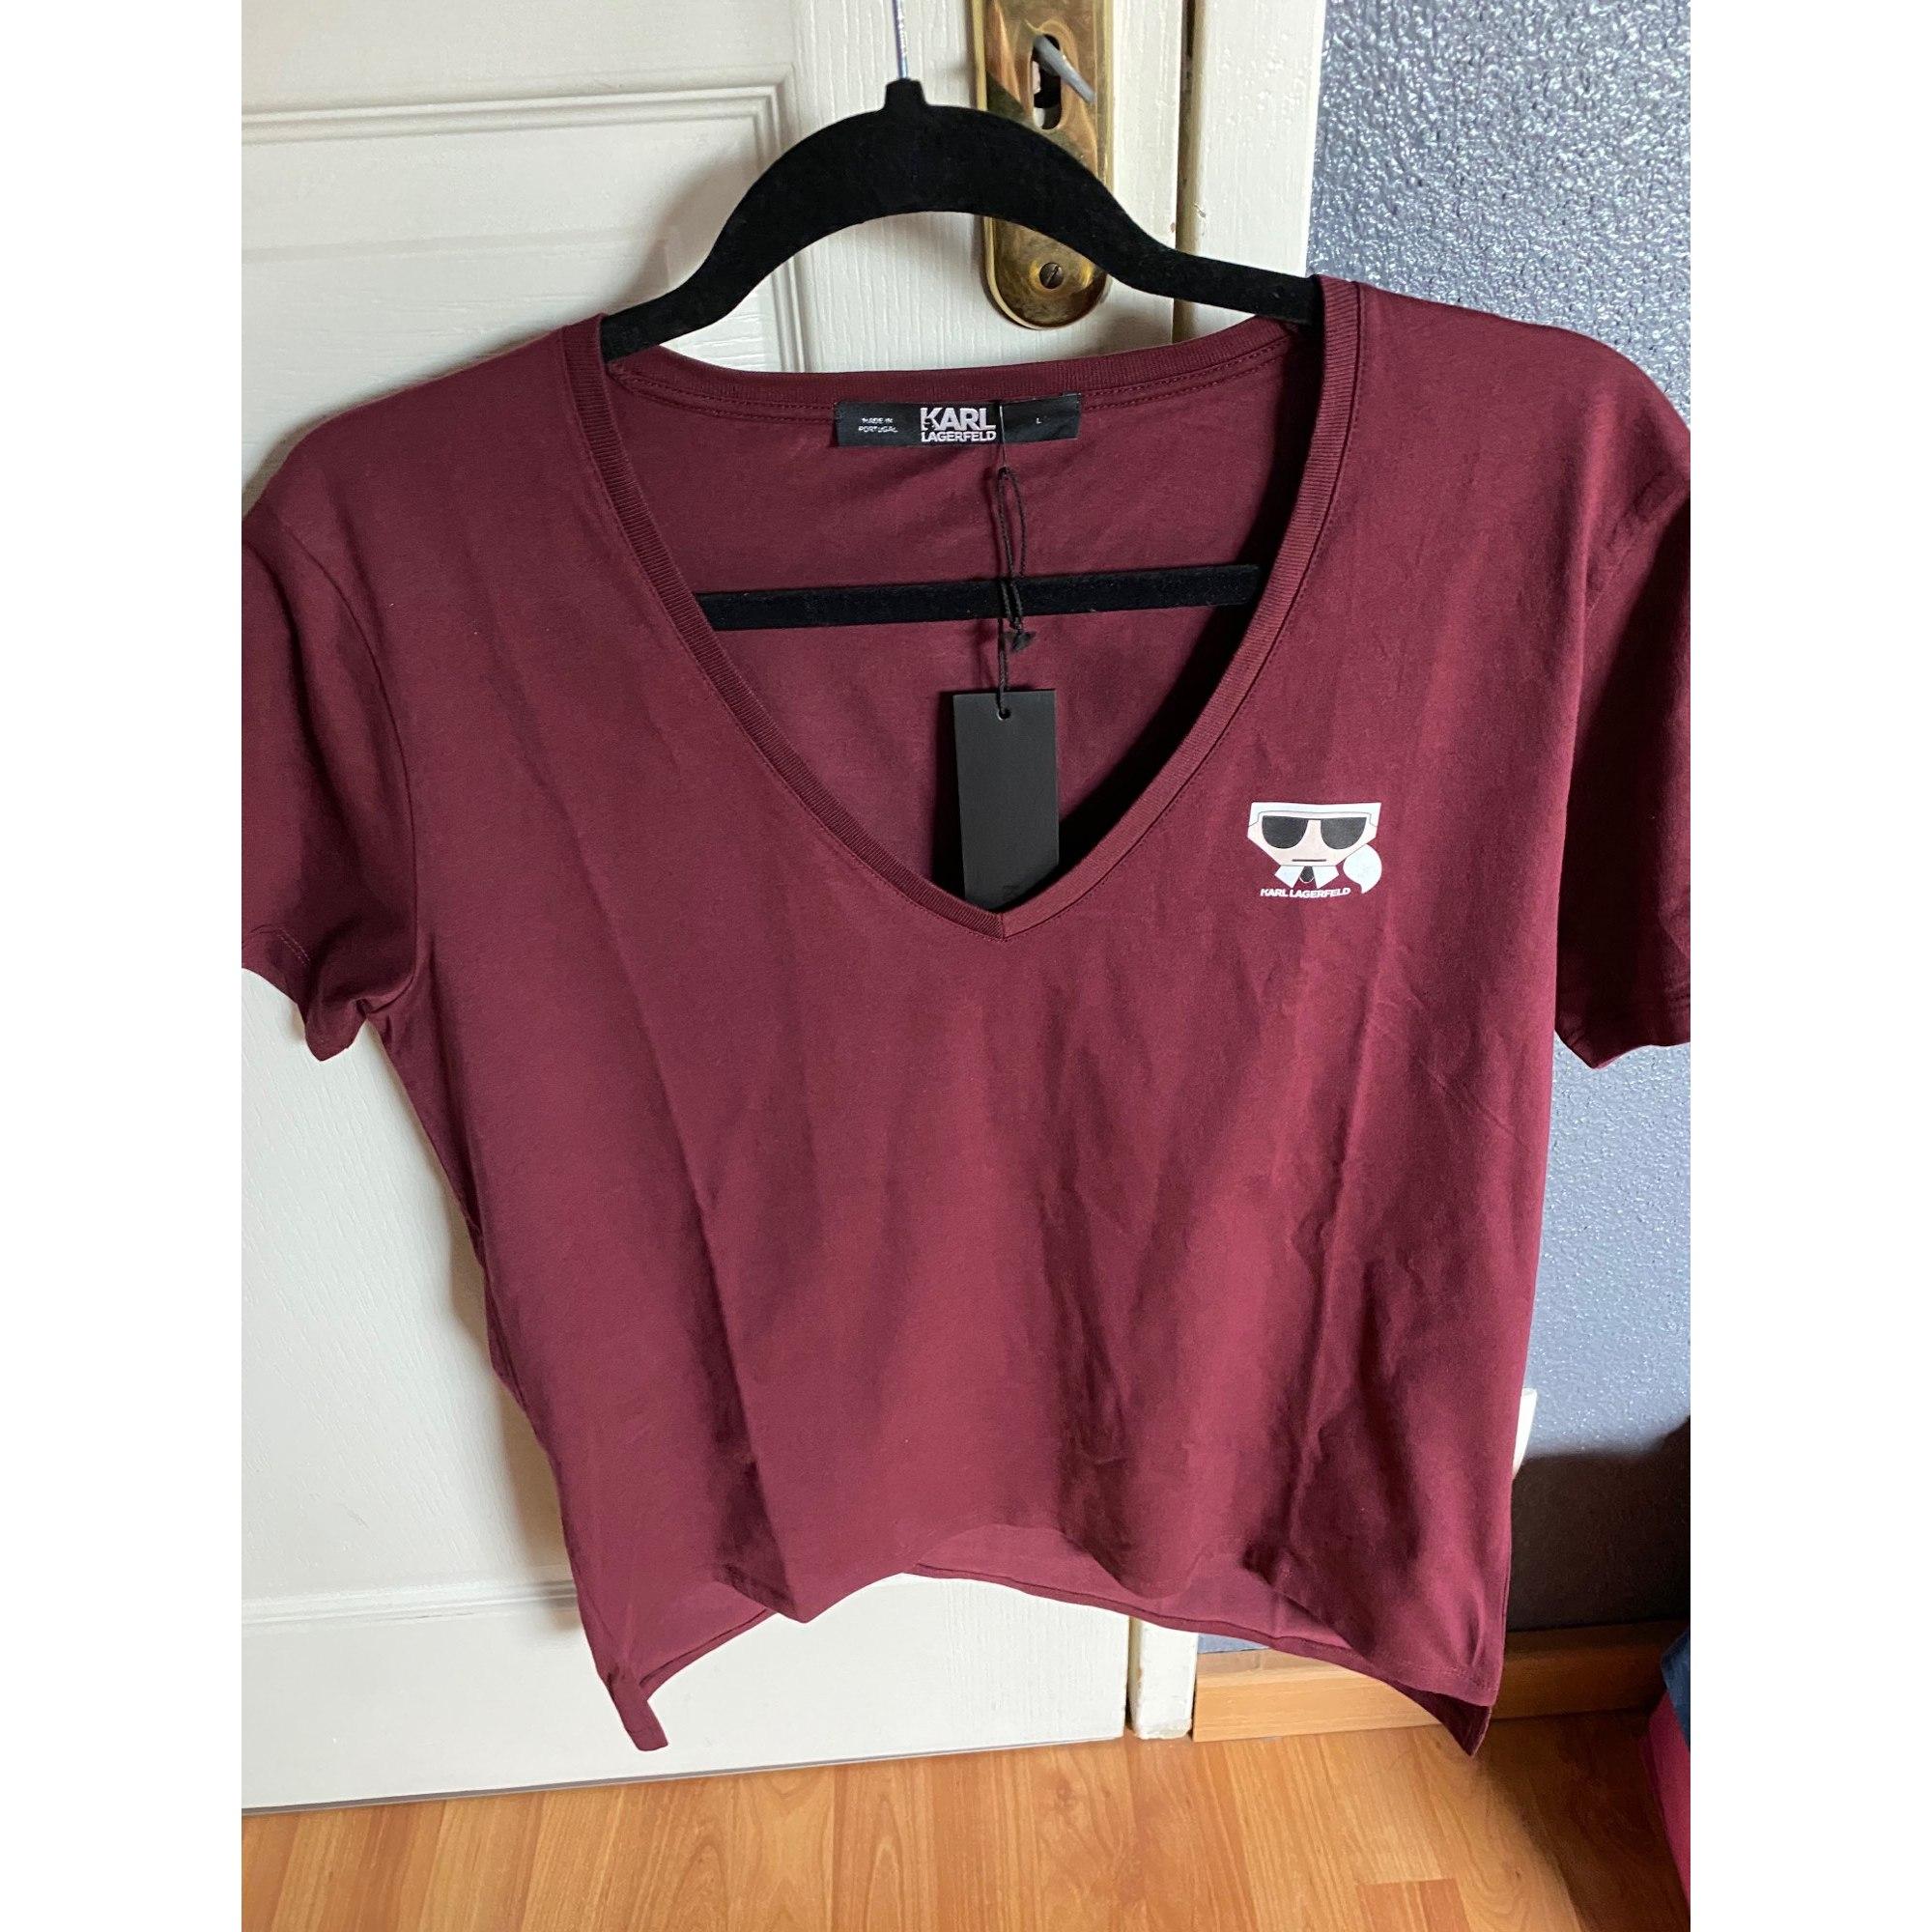 Top, tee-shirt KARL LAGERFELD Rouge, bordeaux